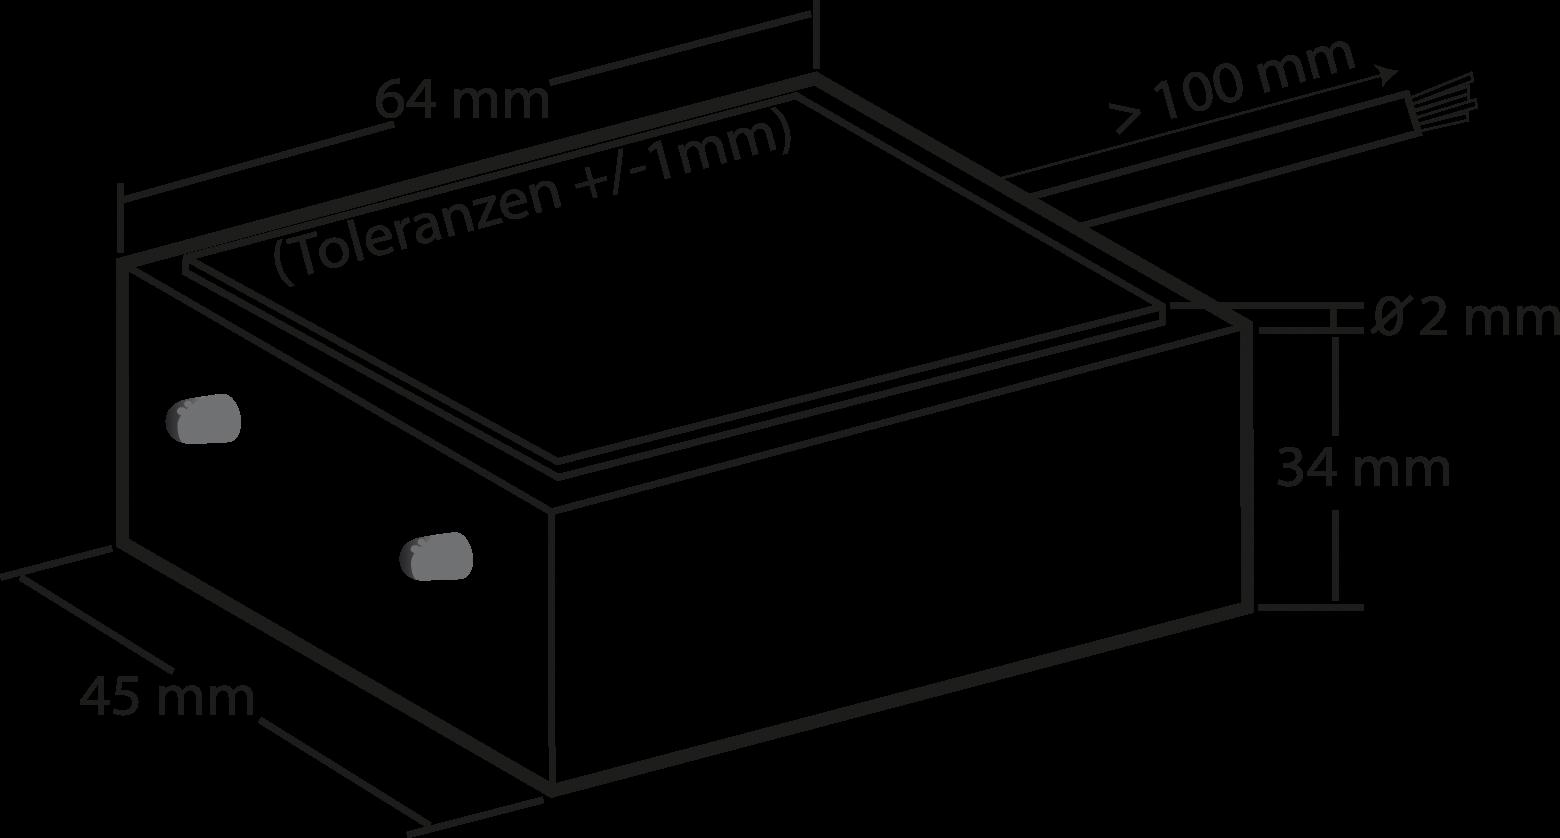 M 152 Regensensor Drahtgebunden Bei Reichelt Elektronik